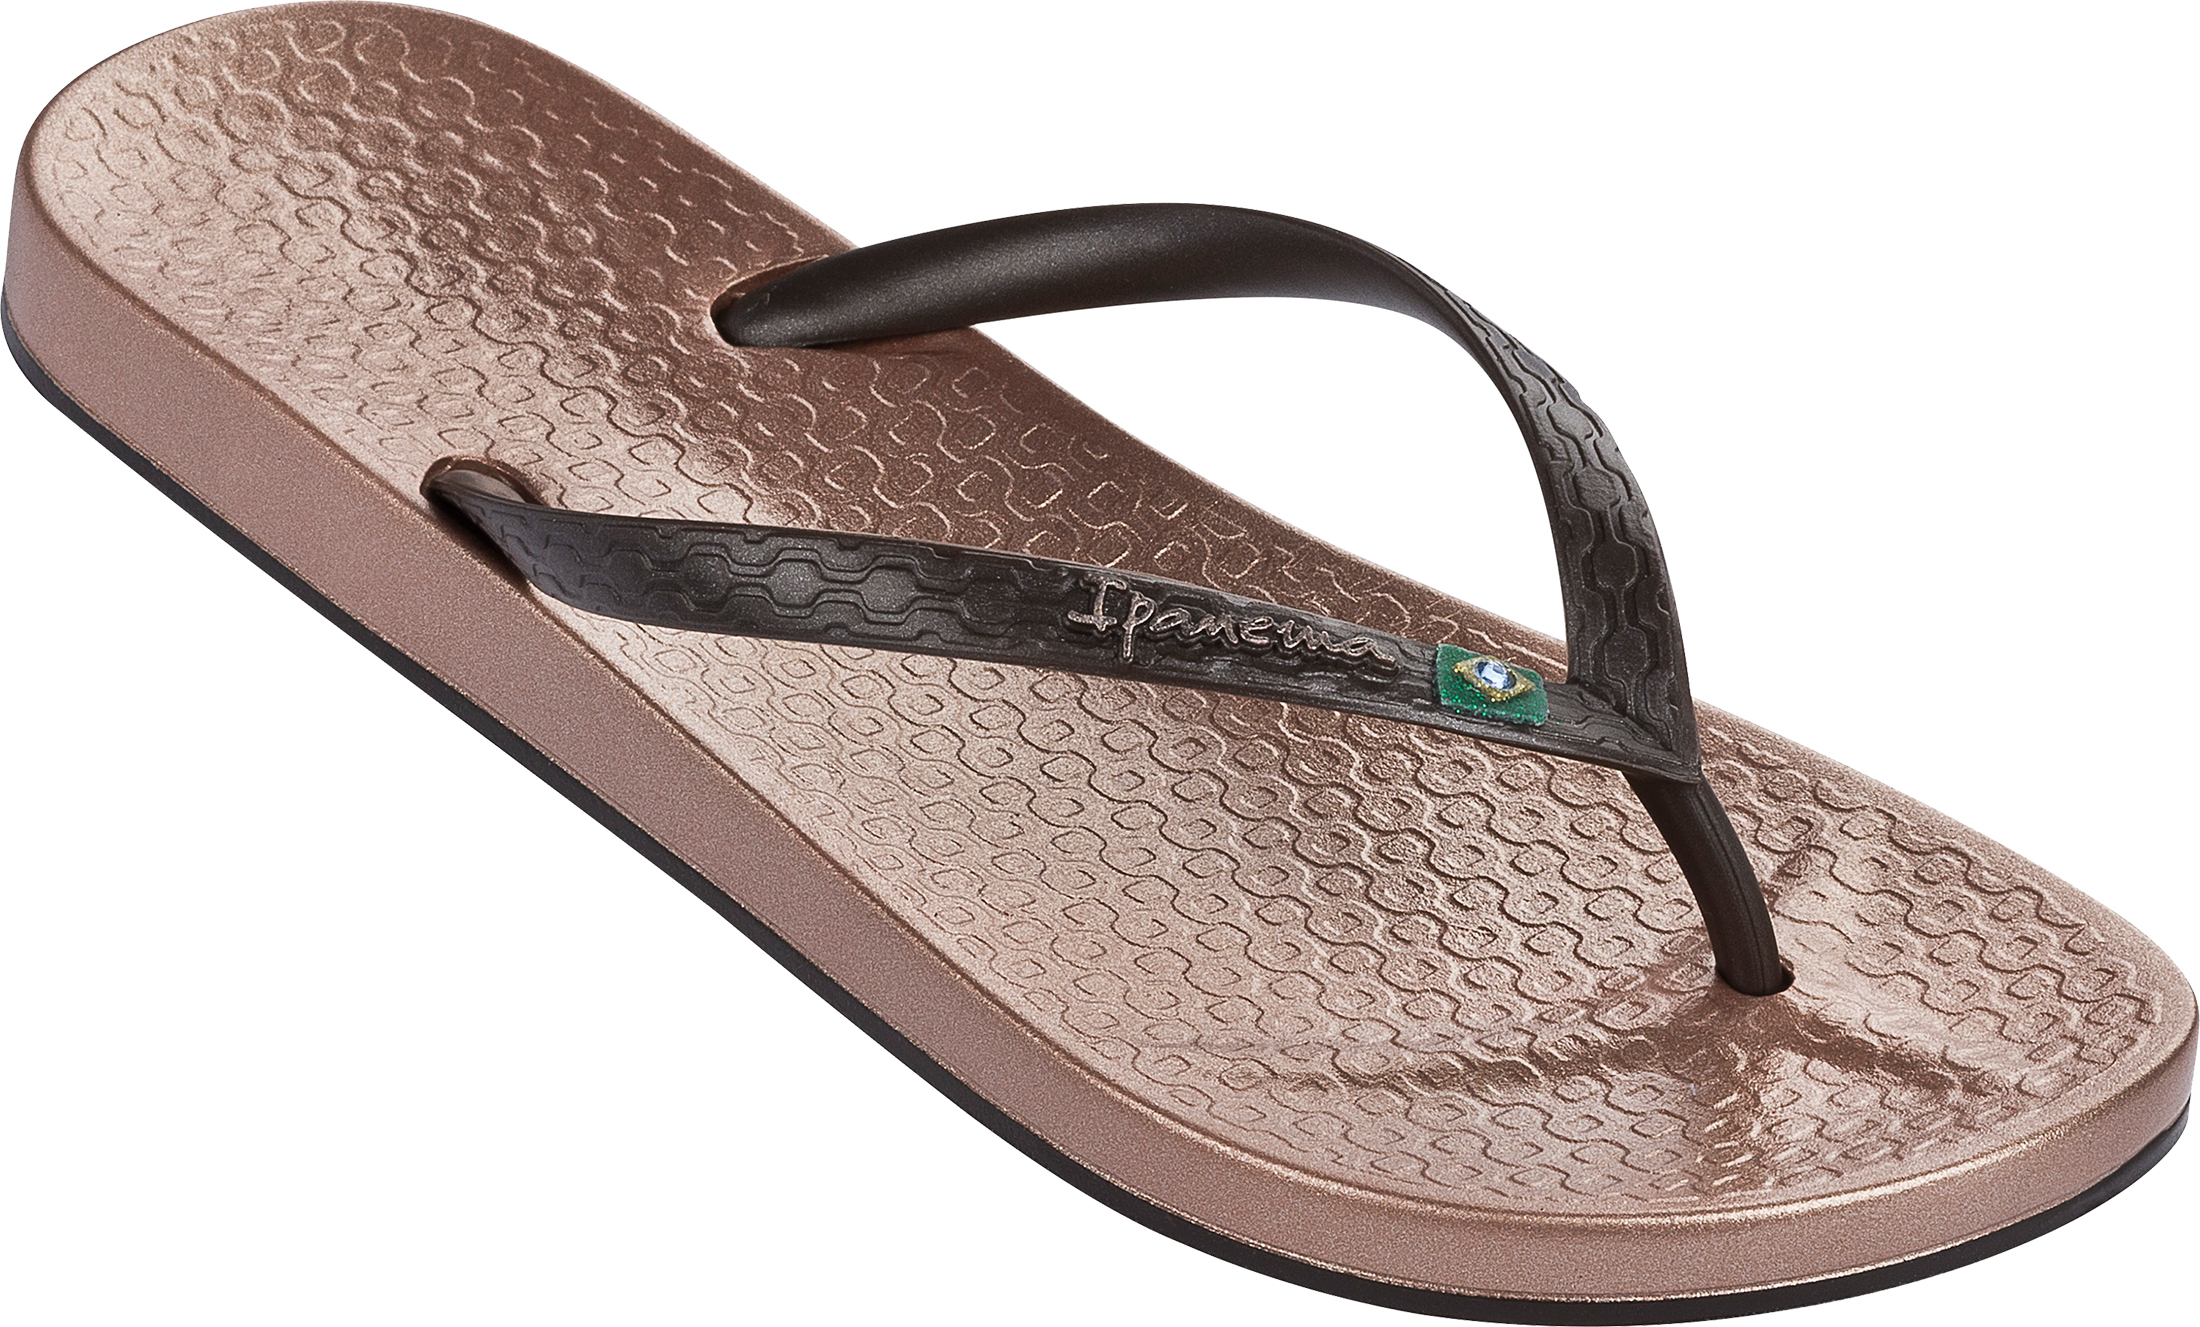 ac051583a08f Ipanema Beach Brasil Flag Slim Footbed Flip Flops Beach Sandals ...